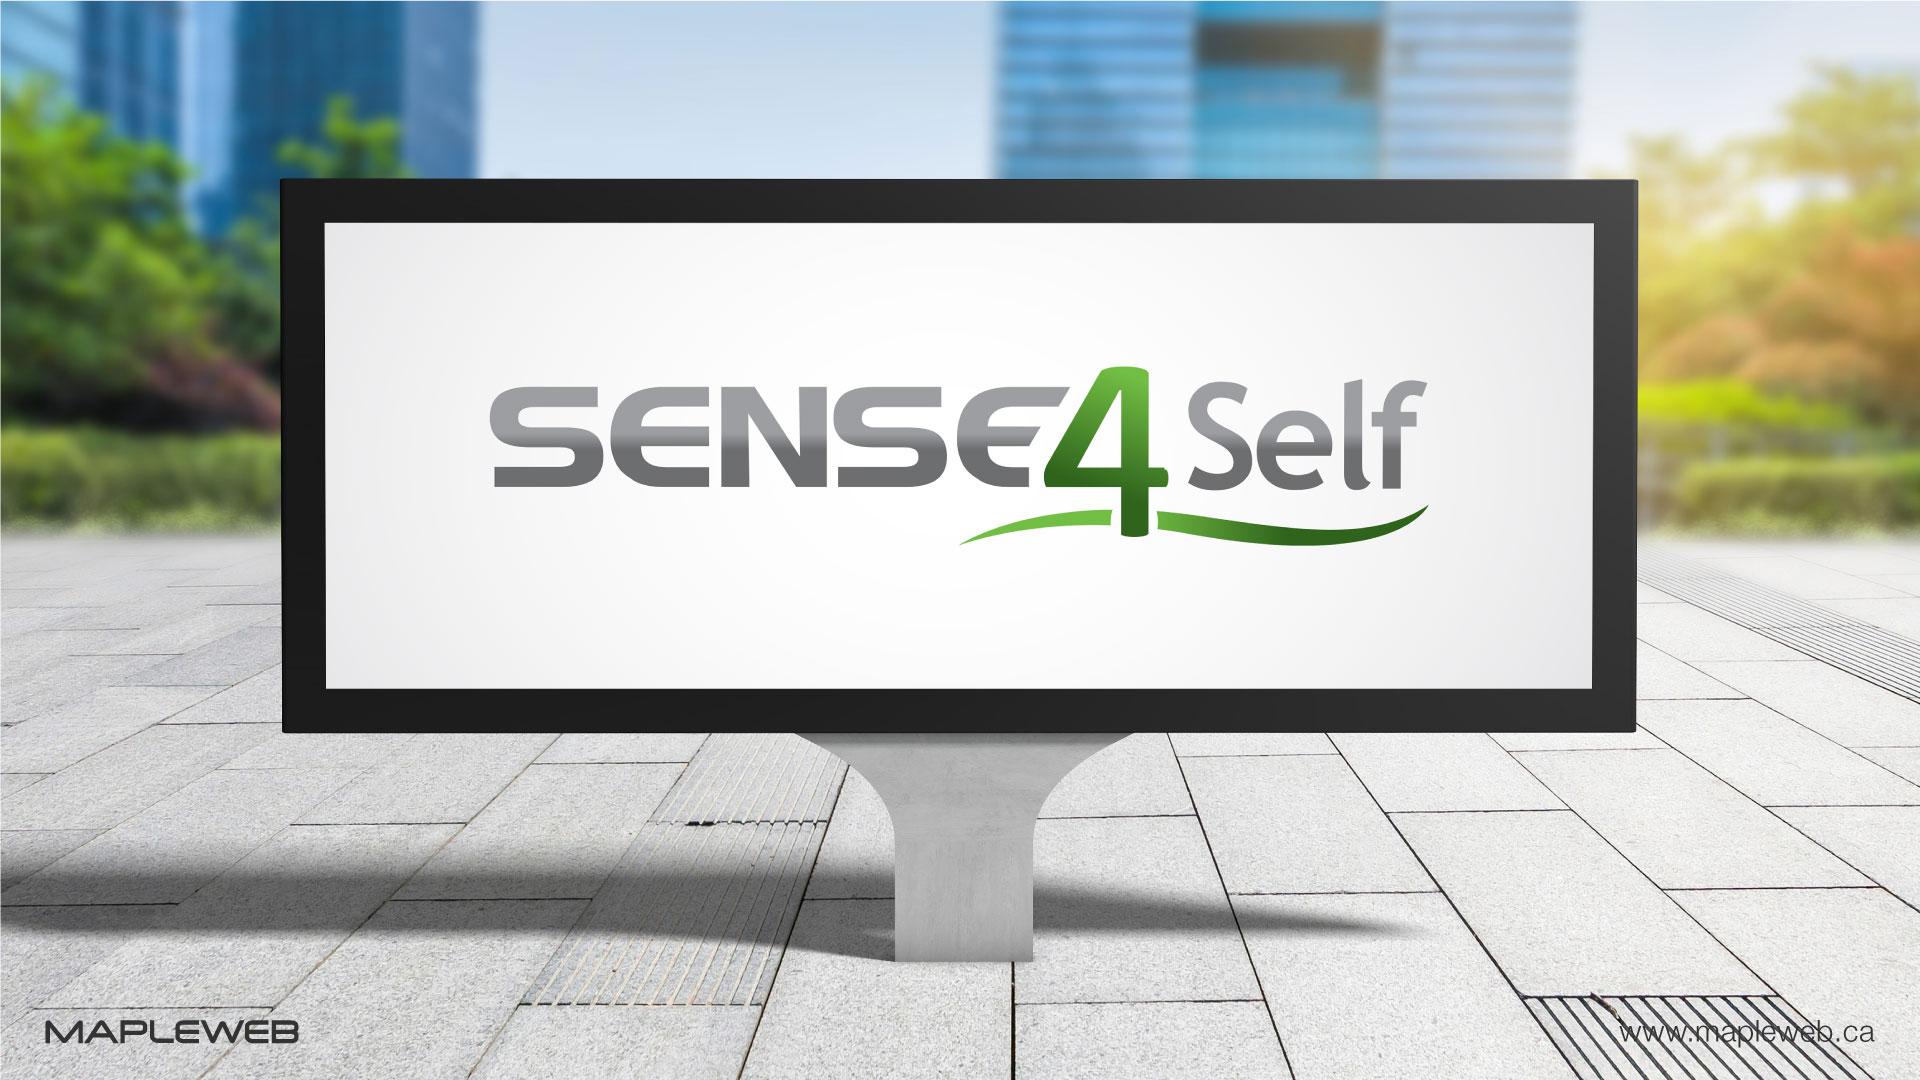 sense-4-self-brand-logo-design-by-mapleweb-vancouver-canada-led-sign-mock